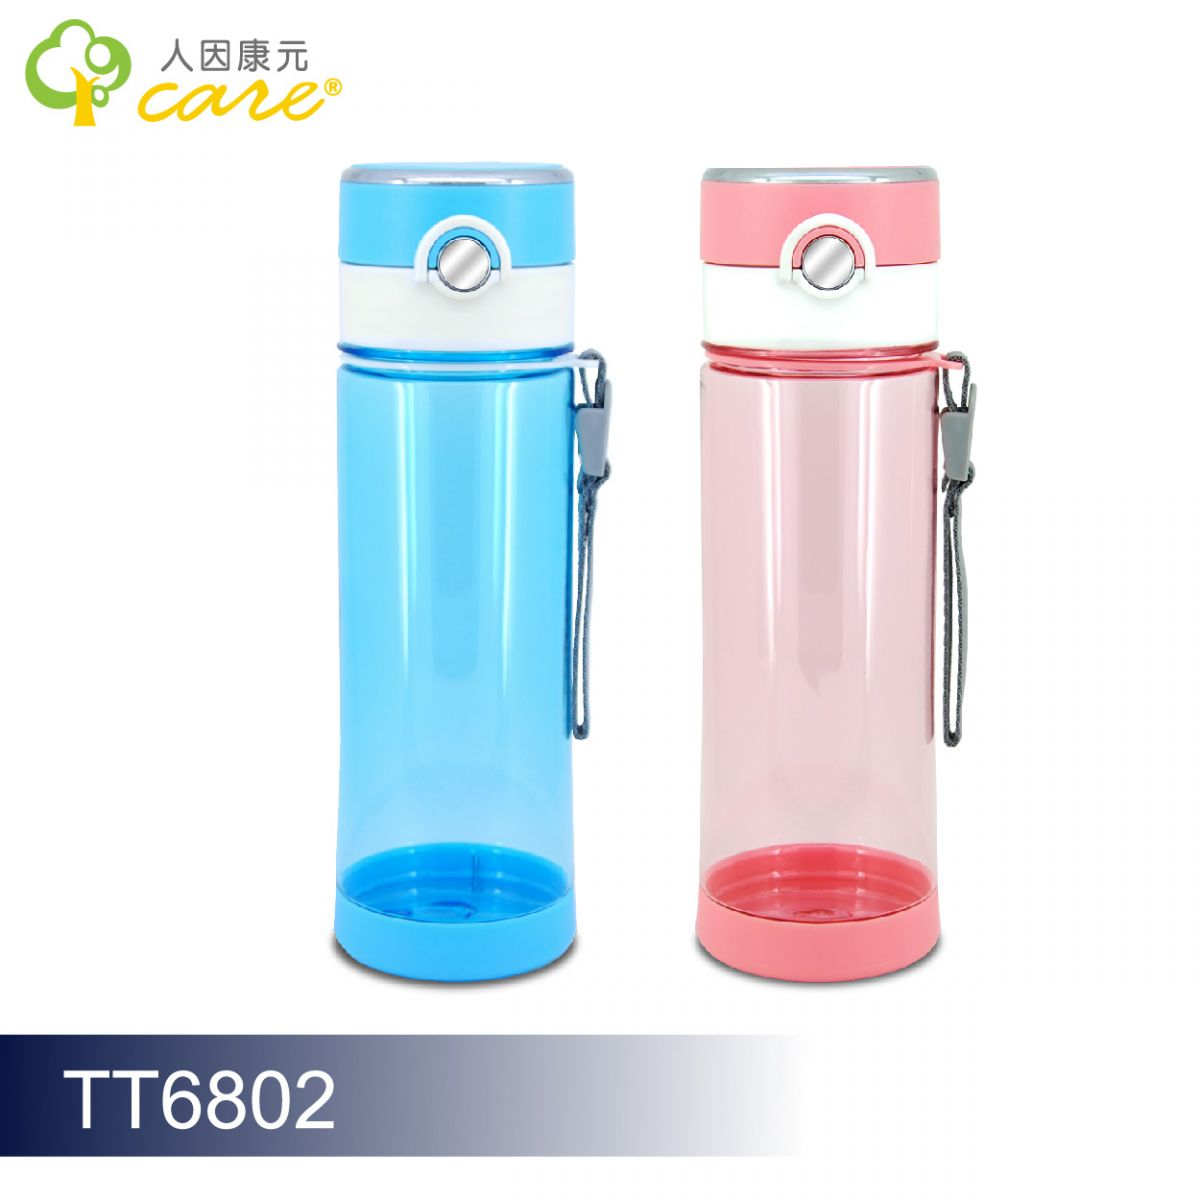 【ErgoCare】新負離子能量冷熱水壺 TT6802B 水晶藍 680ml